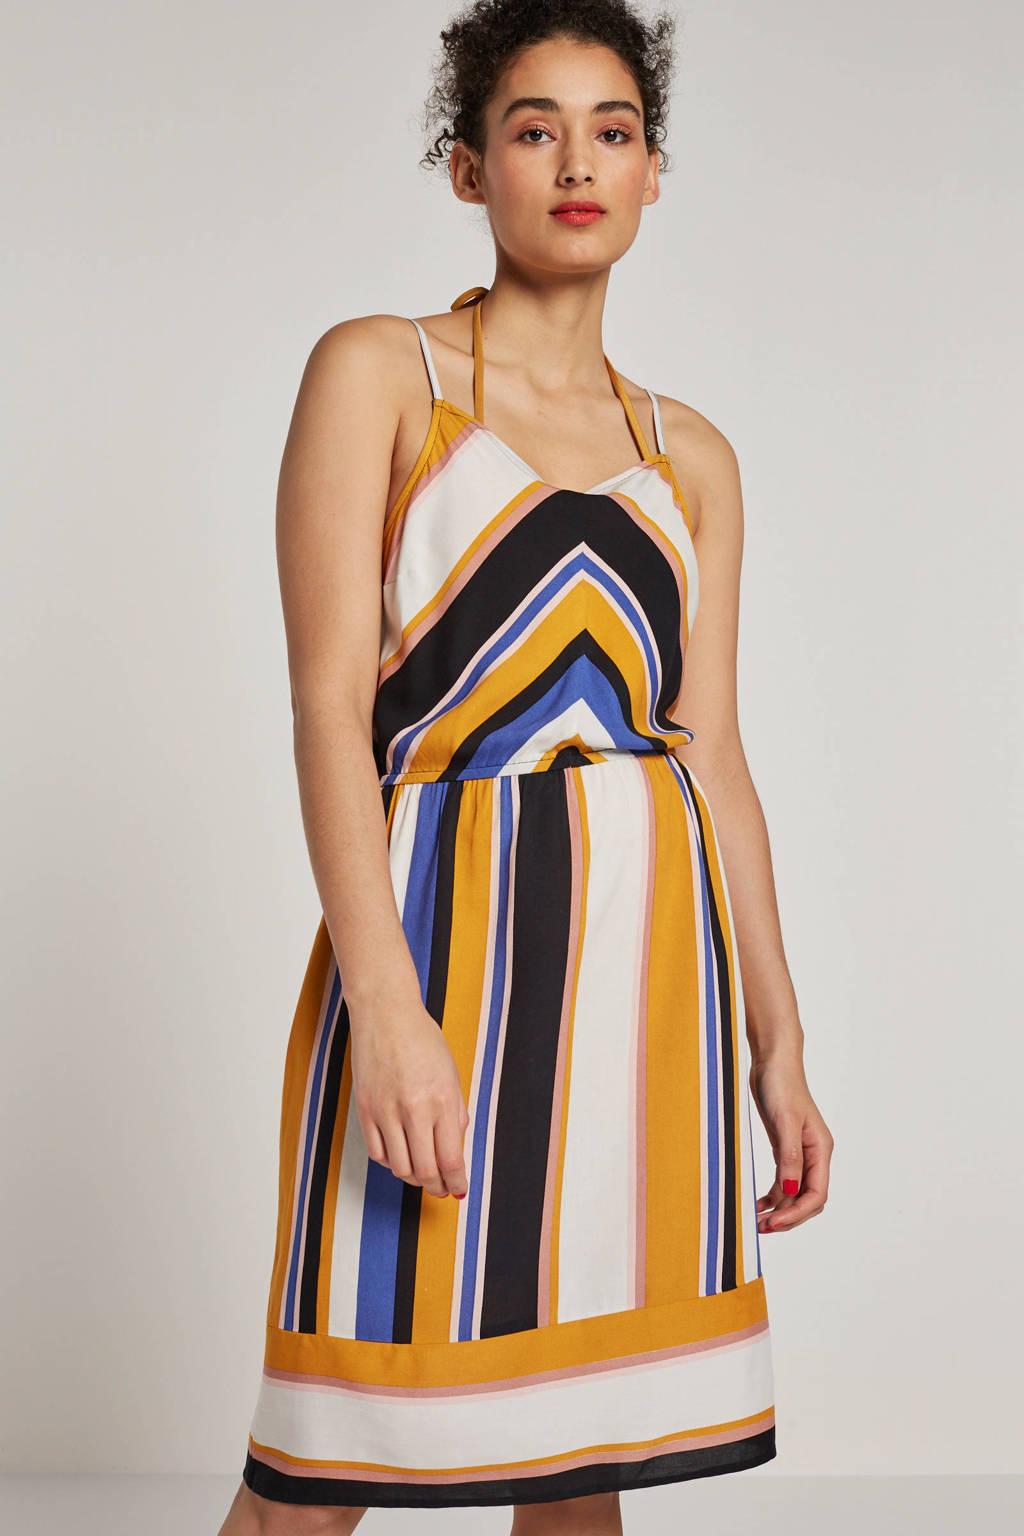 whkmp's beachwave geweven viscose jurk met streepprint, Geel/ecru/zwart/blauw